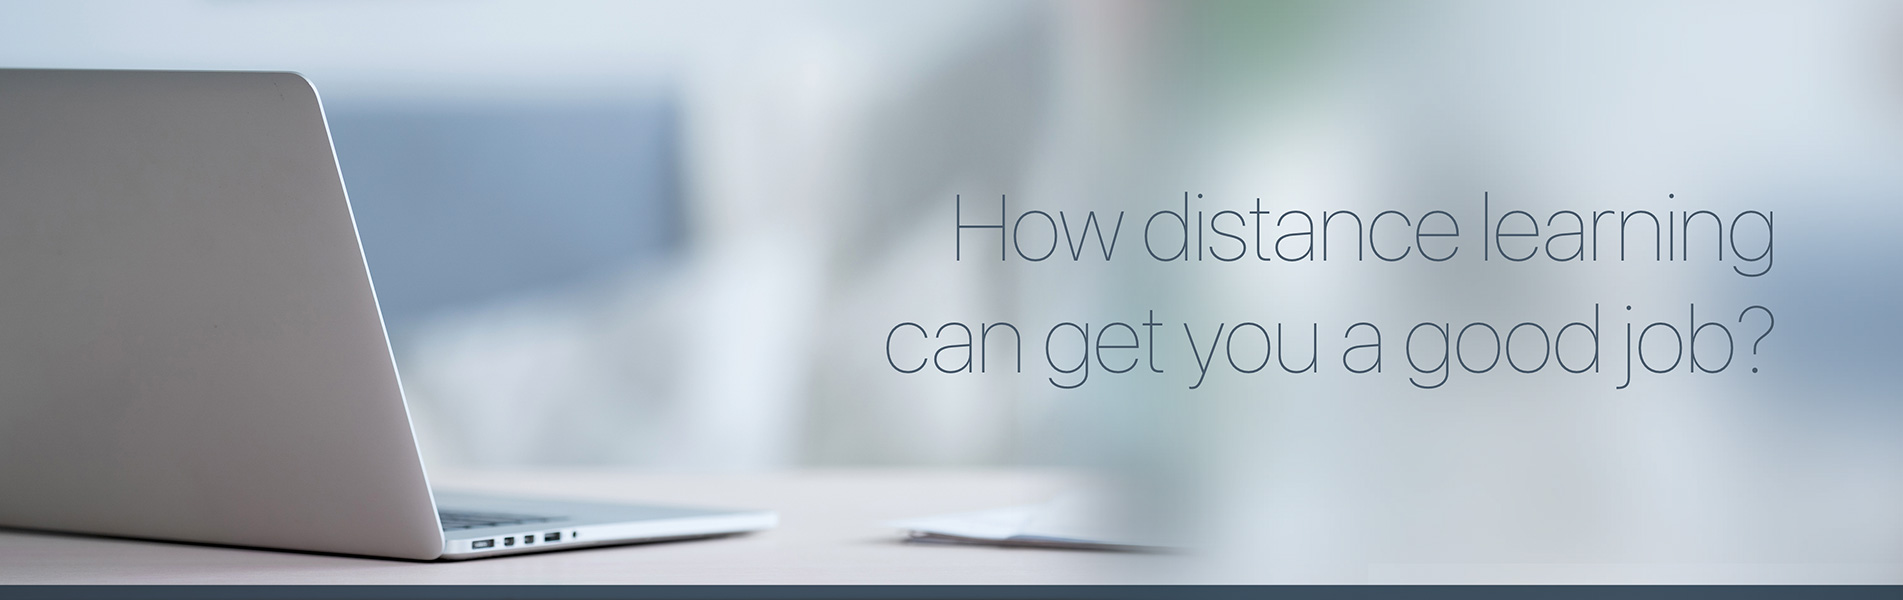 distance learning, job, career